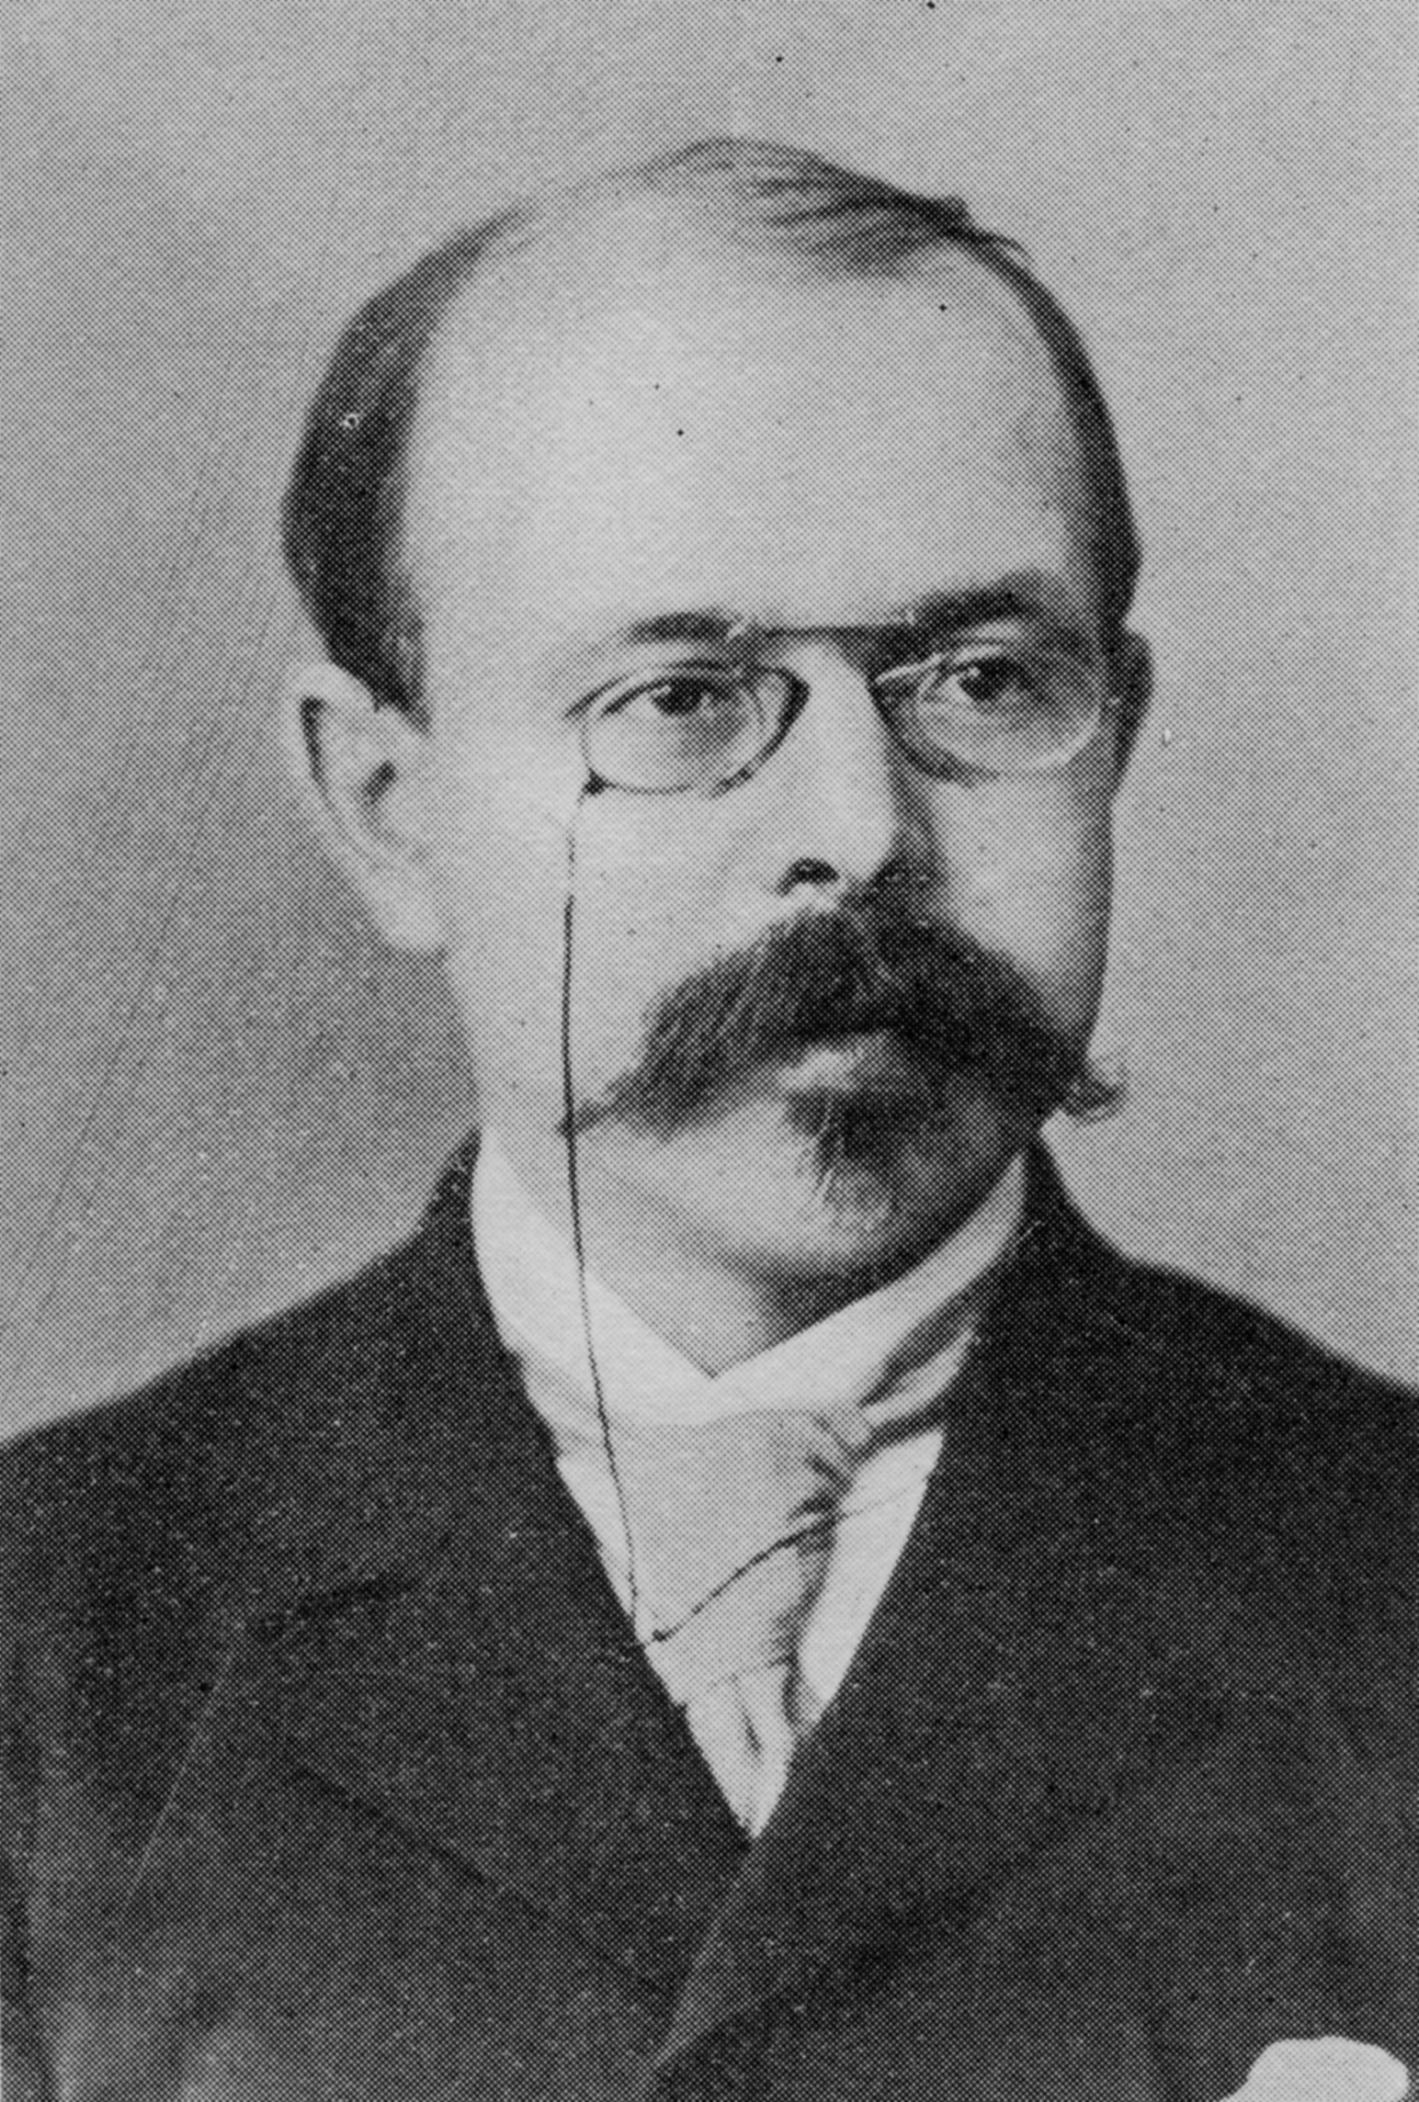 Portrait of Walther Nernst